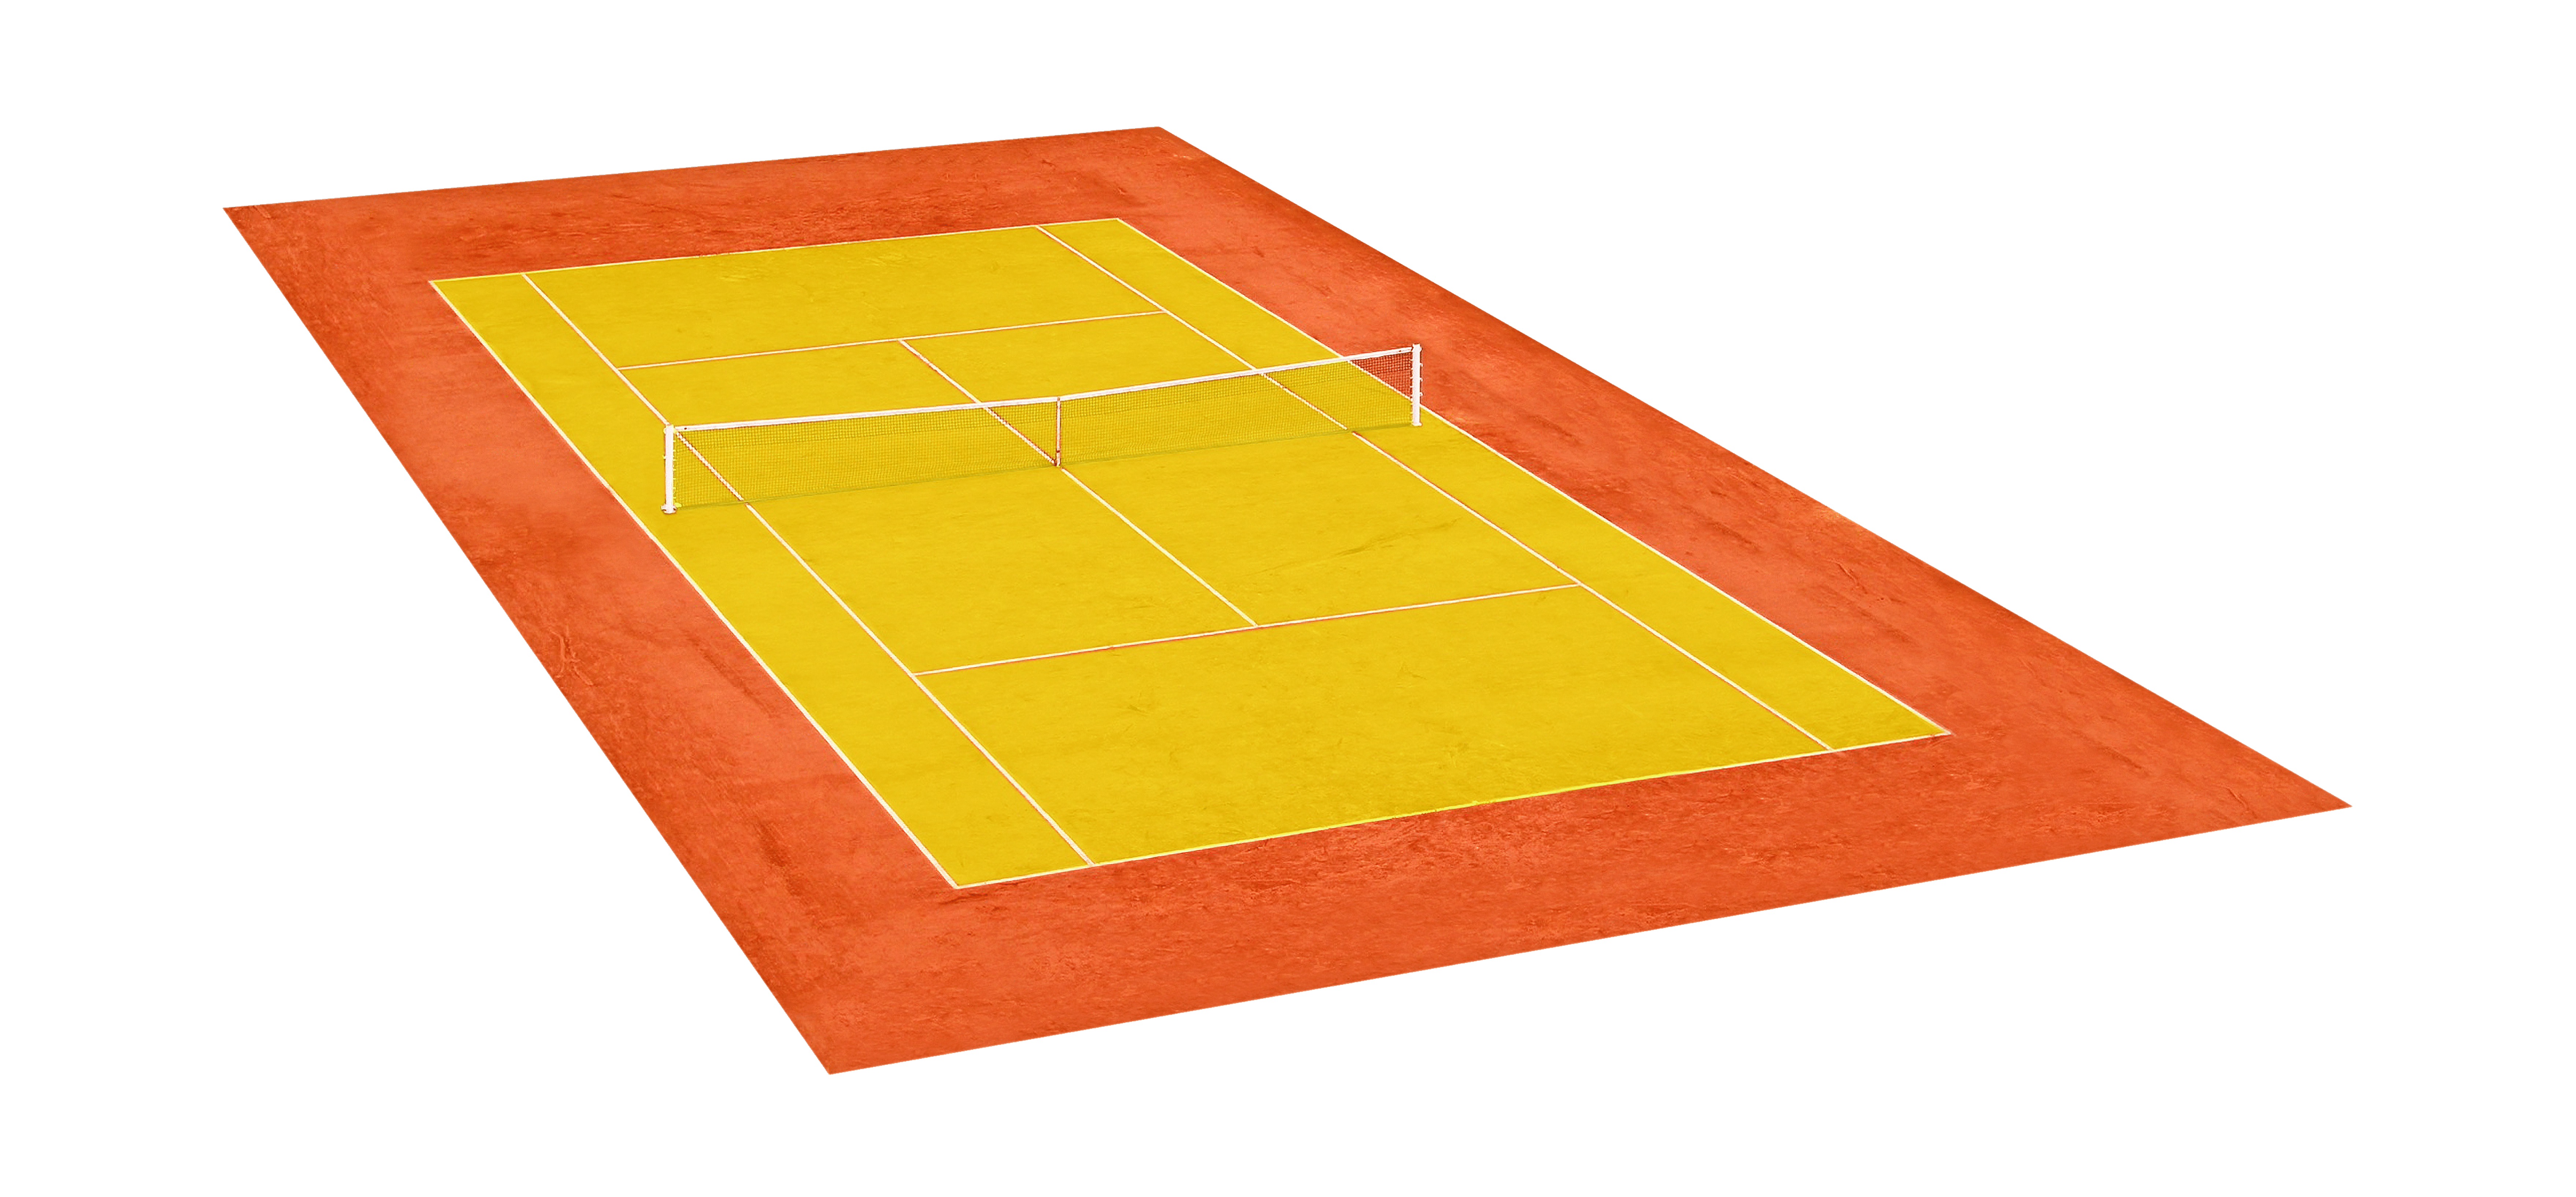 Tennis Geschichte: Tennis früher – Der City Outlet Blog